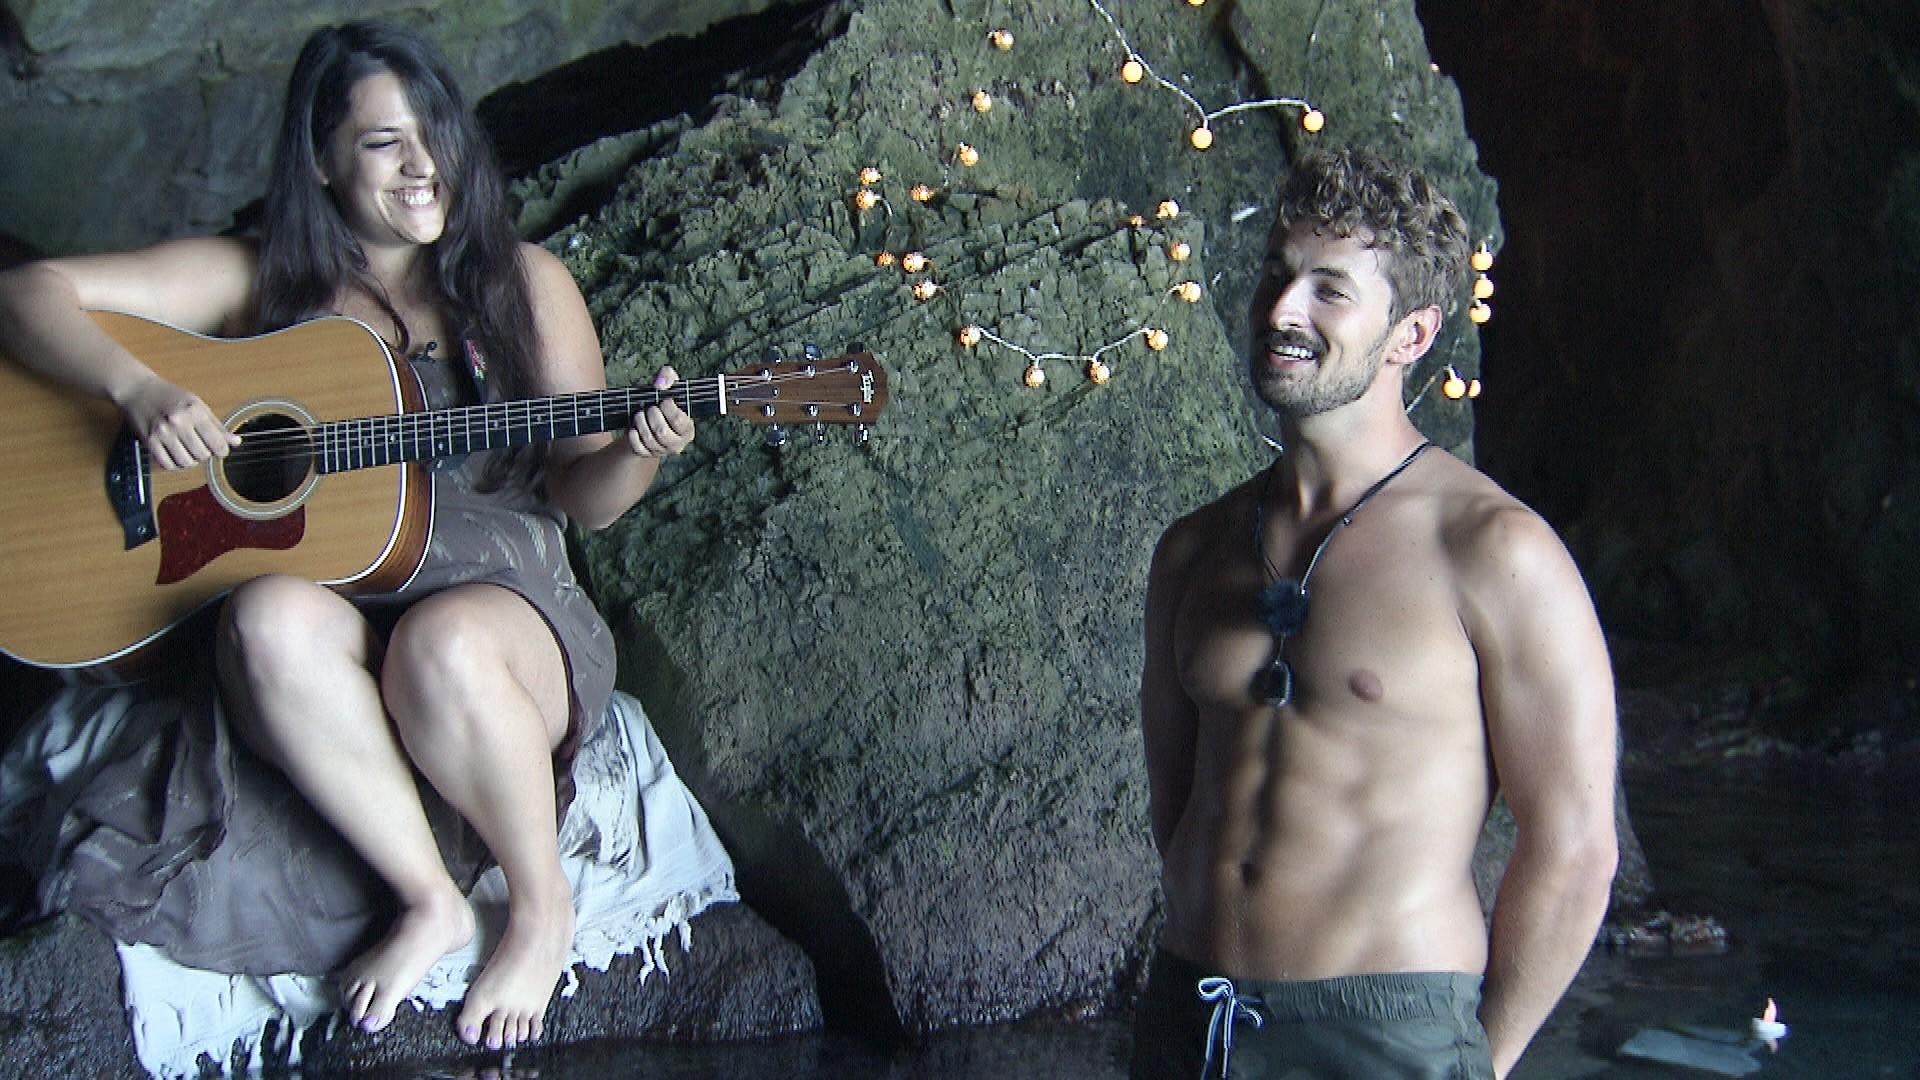 Prince Charming 2019 Folge 4 - Nicolas und Andreas küssen sich